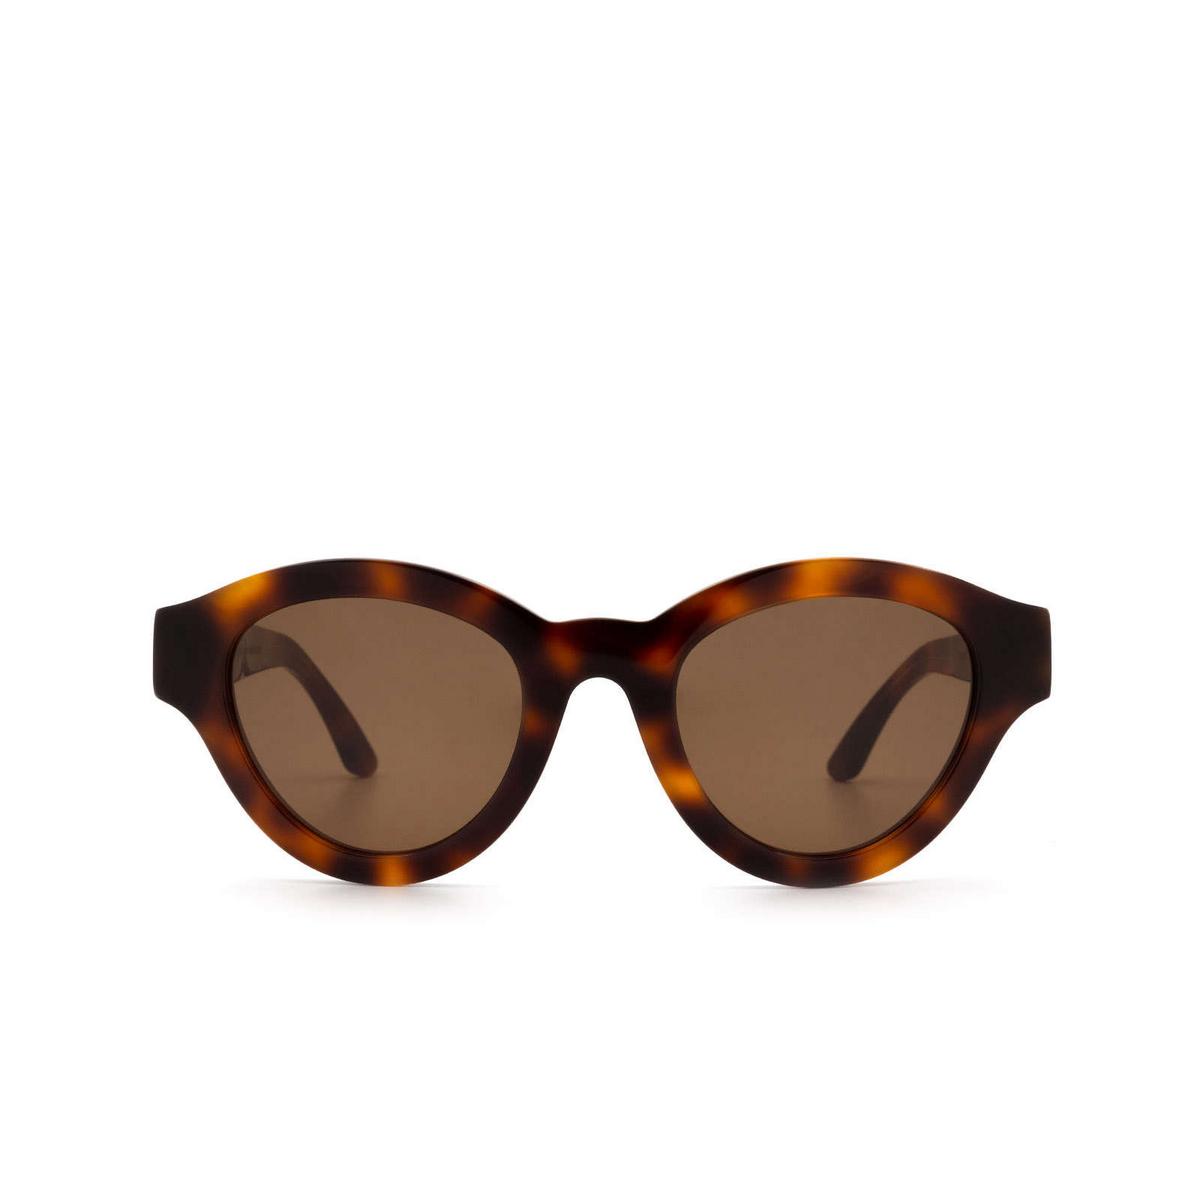 Huma® Cat-eye Sunglasses: Dug color Havana 00 - front view.